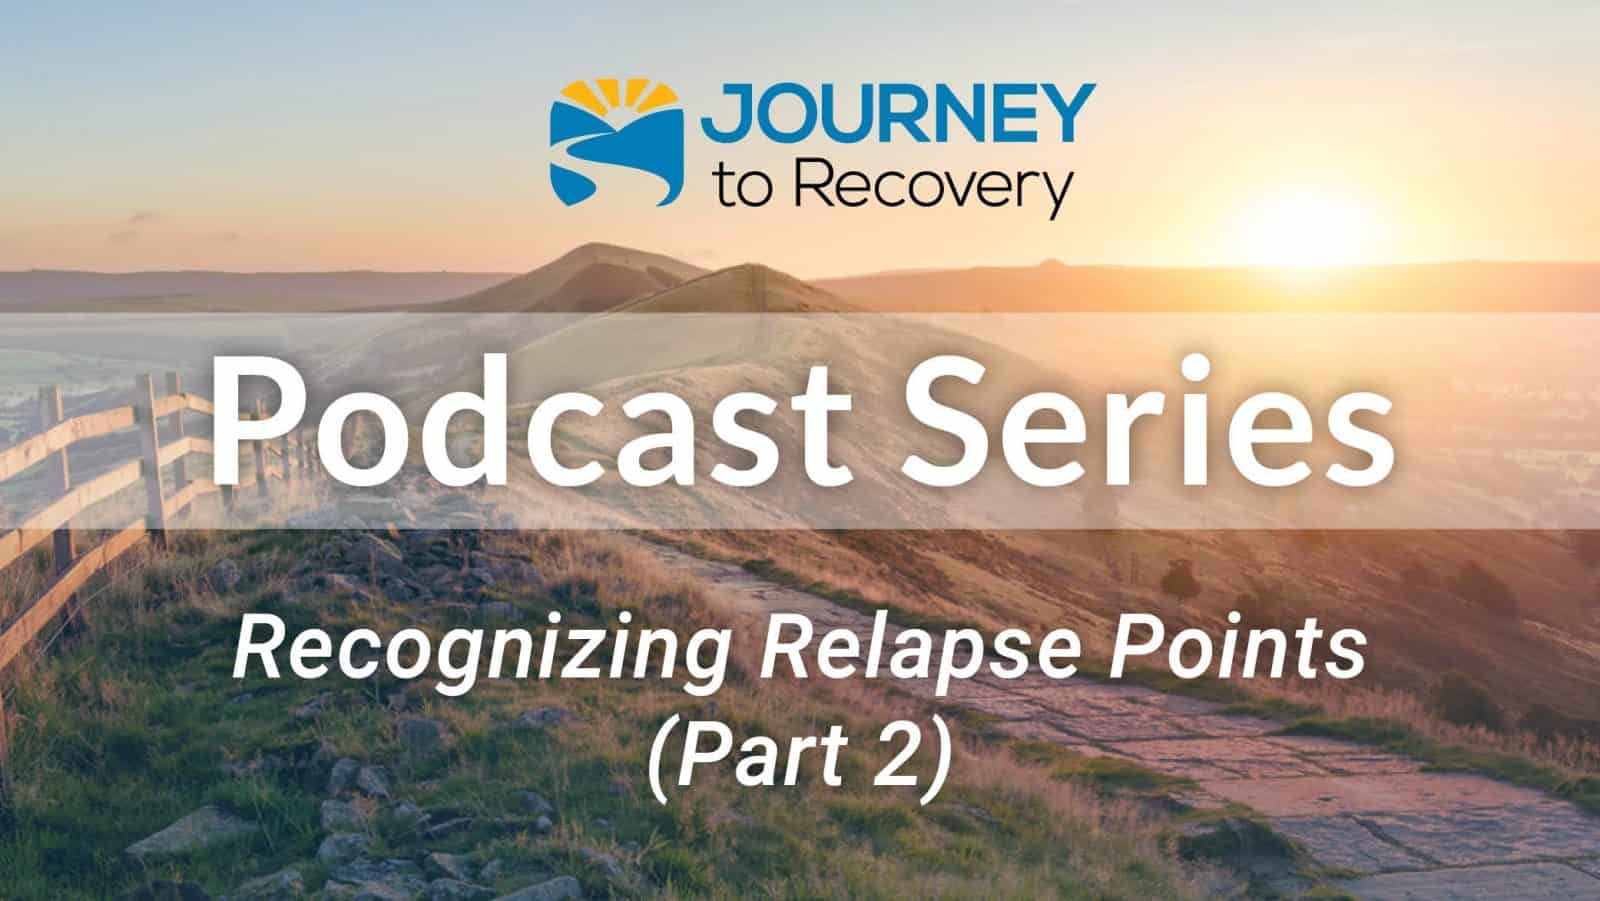 Recognizing Relapse Points (Part 2)